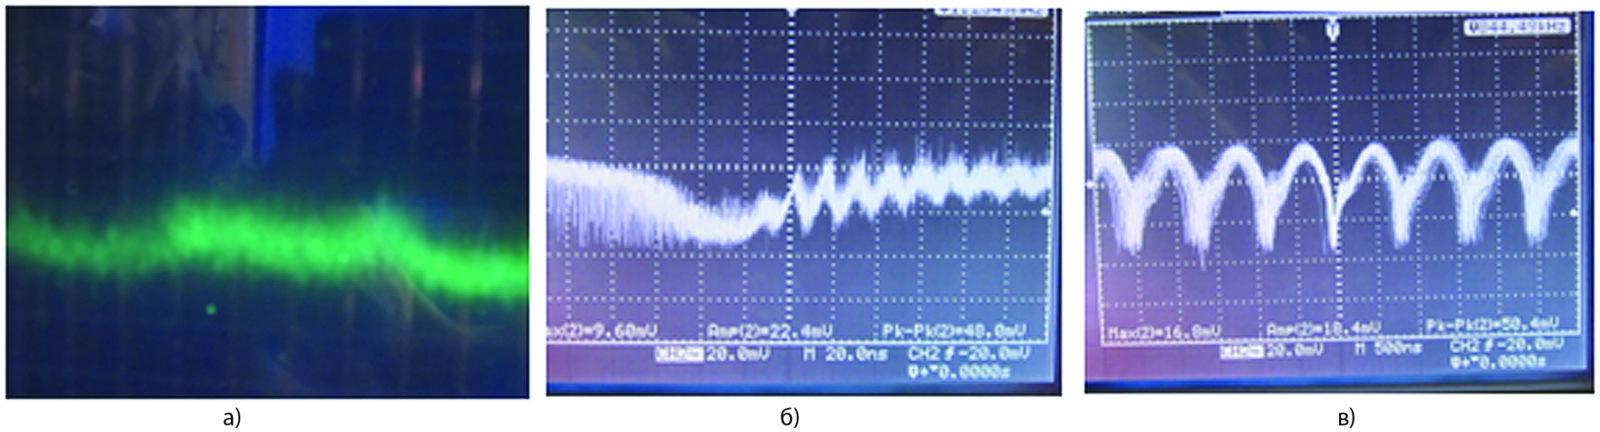 Спектр ВЧ-сигнала (a) и cигнал детектора при токе 85 мA: t1 = 10 нс/дел (б), t2 = 500 нс/дел (в)